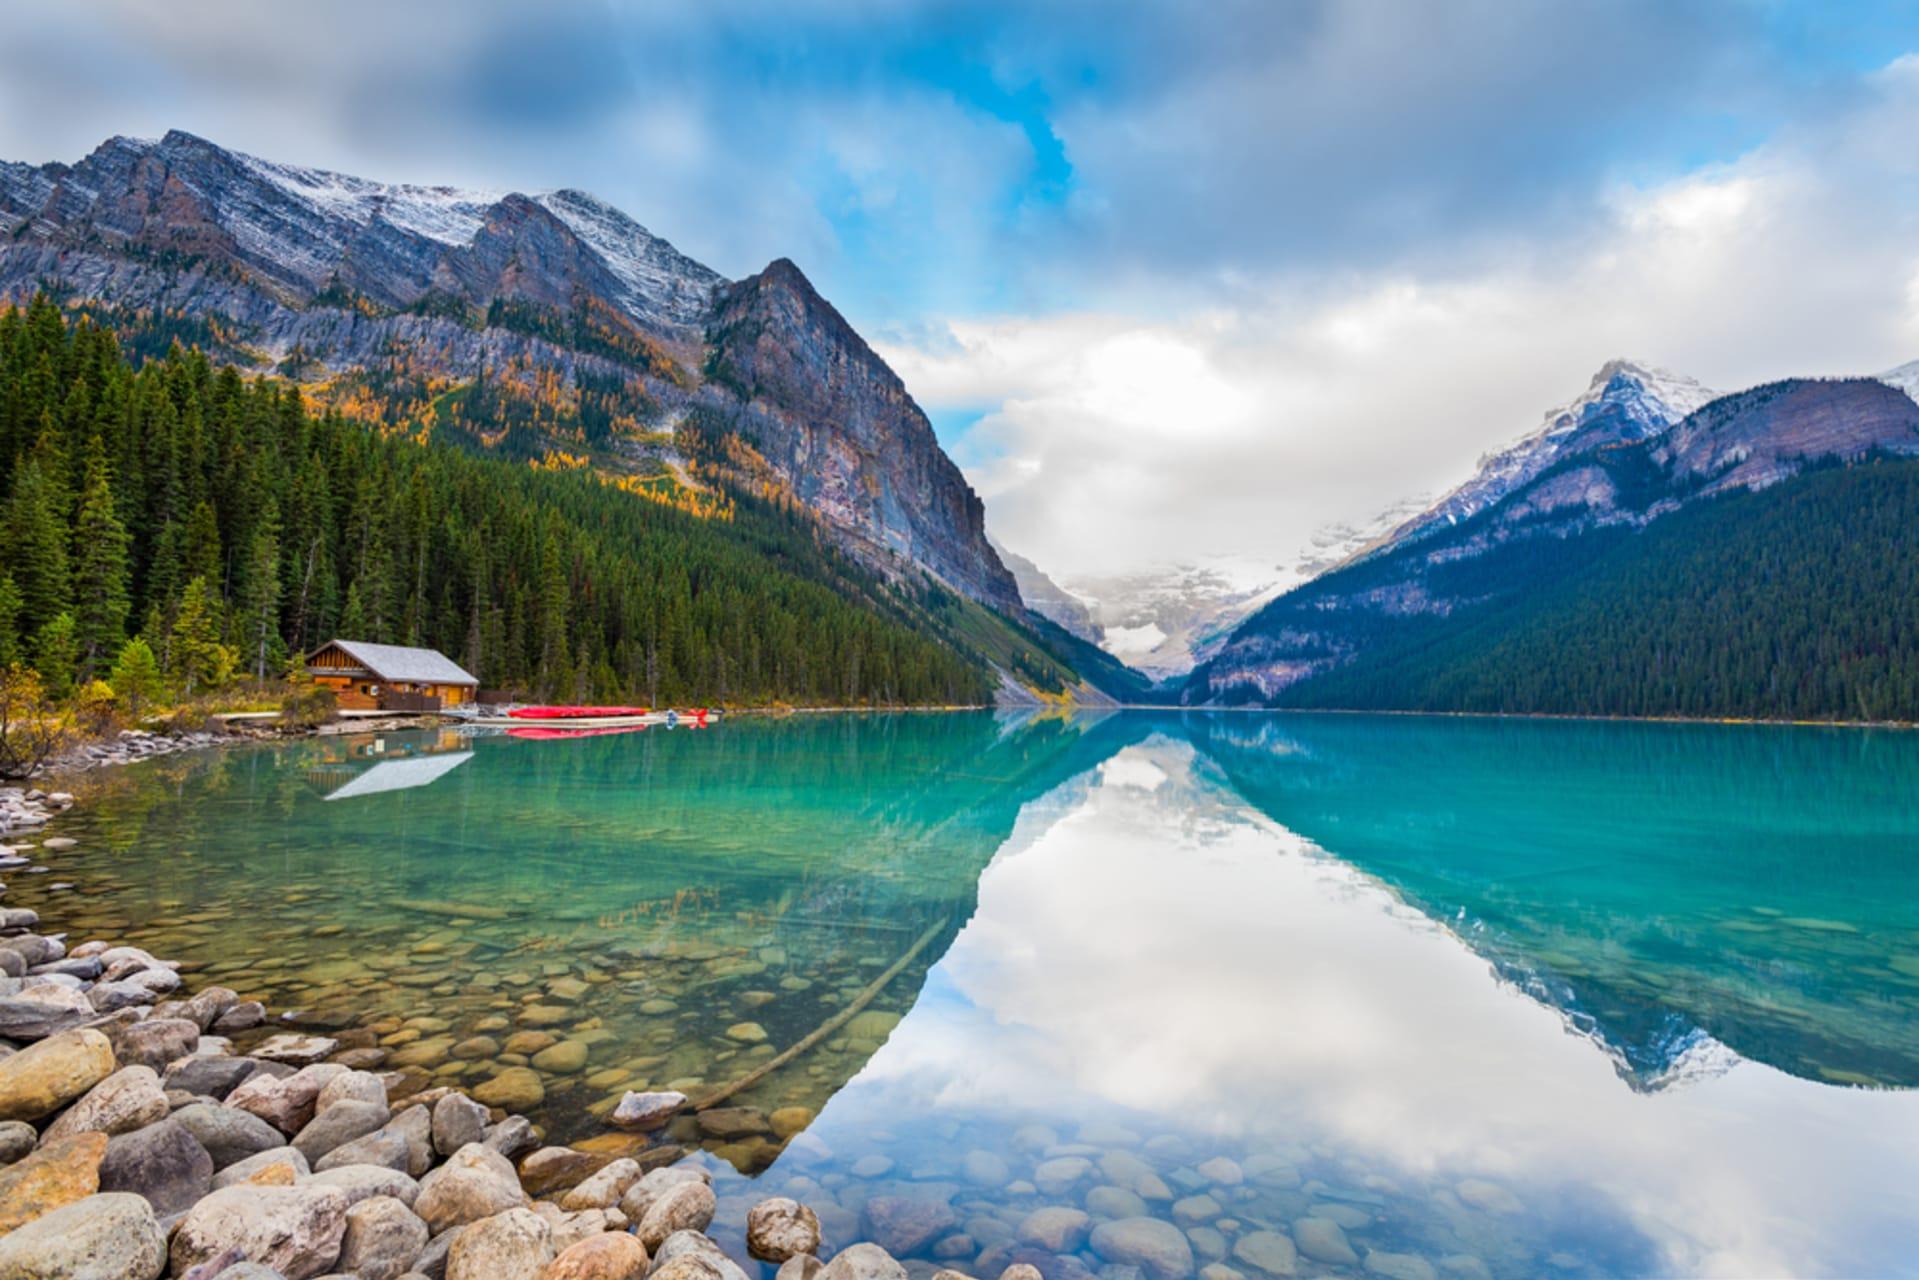 Banff - Discover Iconic Lake Louise